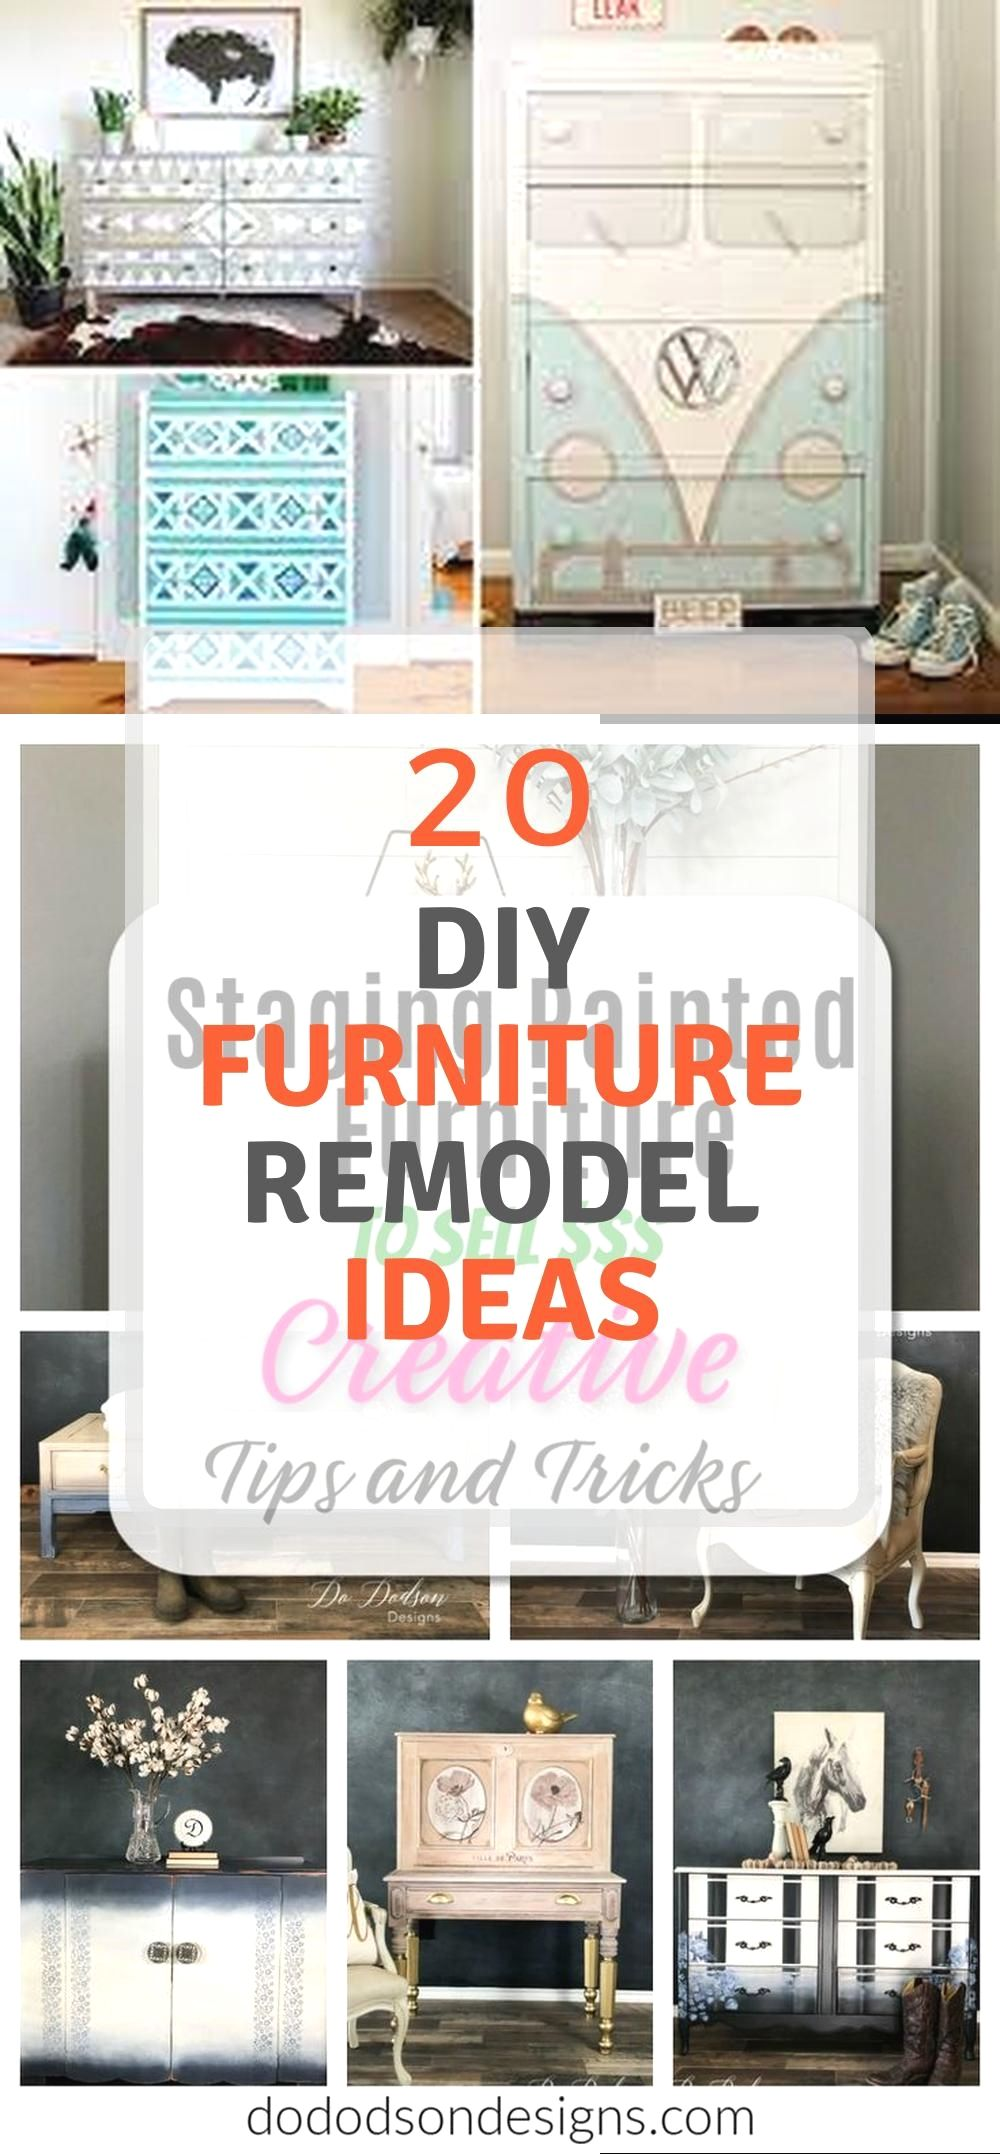 Cheap Furniture Repurposed Ideas In 2021 Diy Furniture Renovation Cheap Furniture Makeover Furniture Makeover